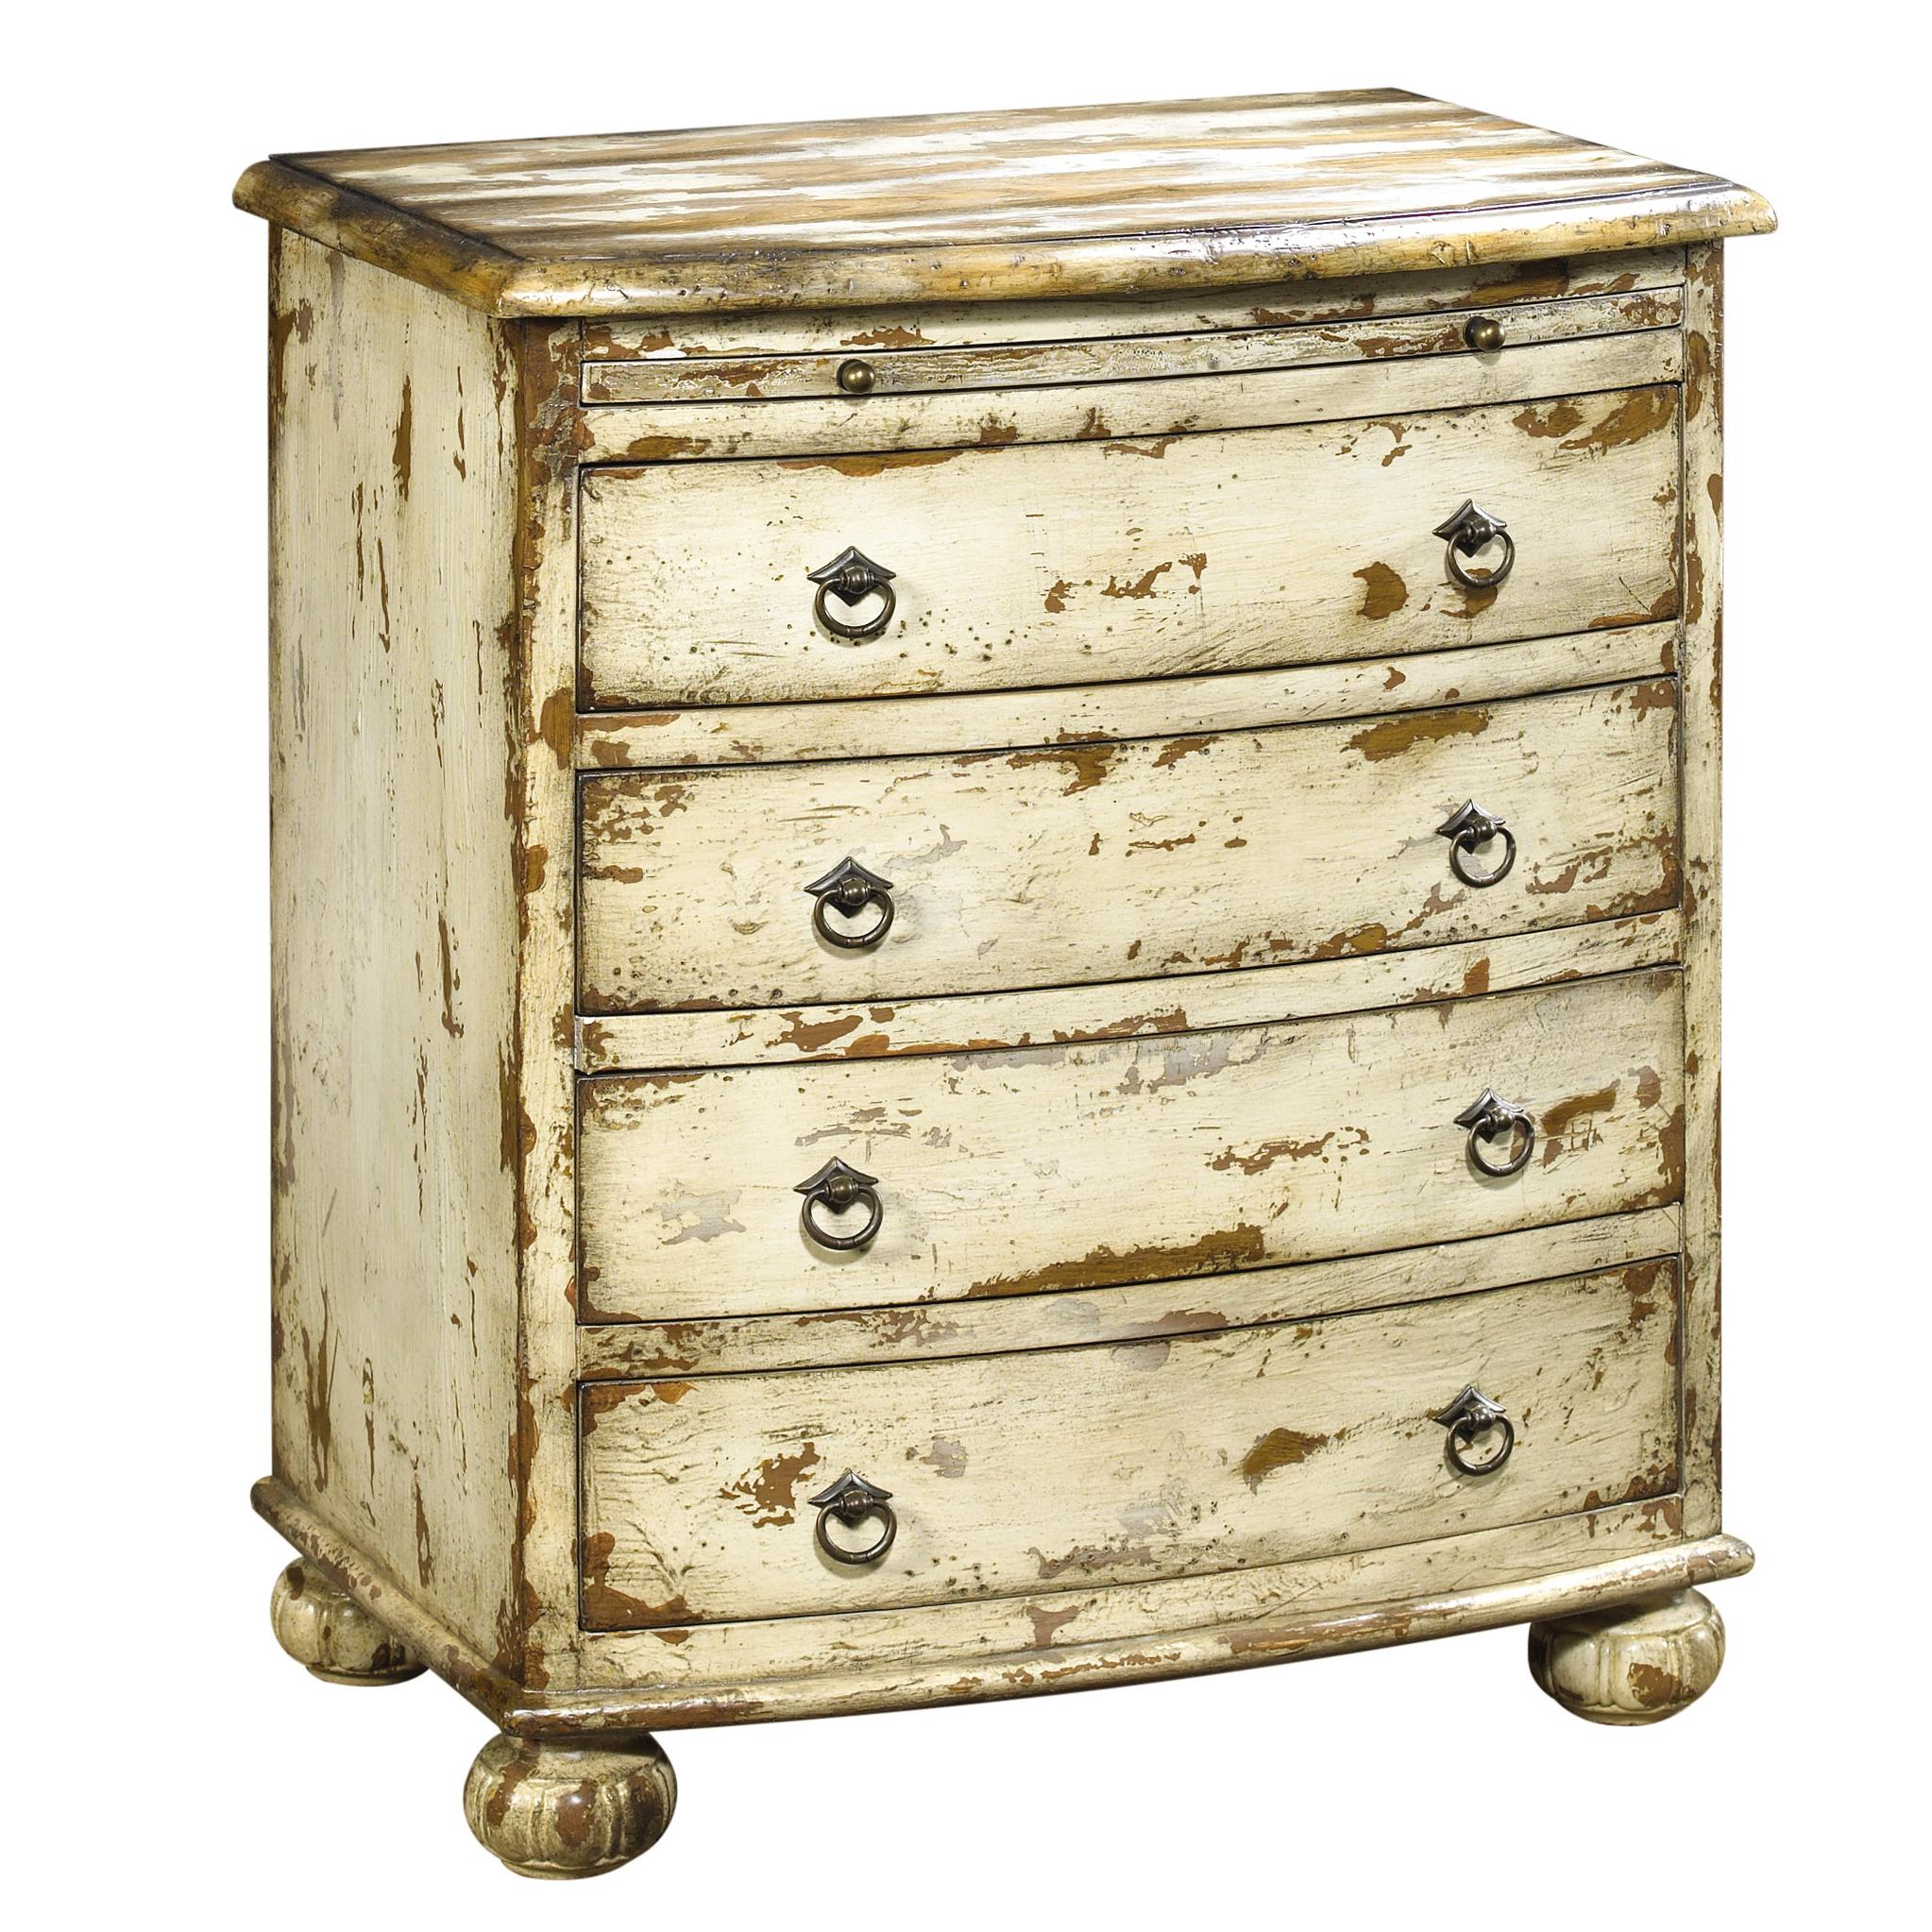 Pulaski Furniture Accents White Washed Colton Accent Chest